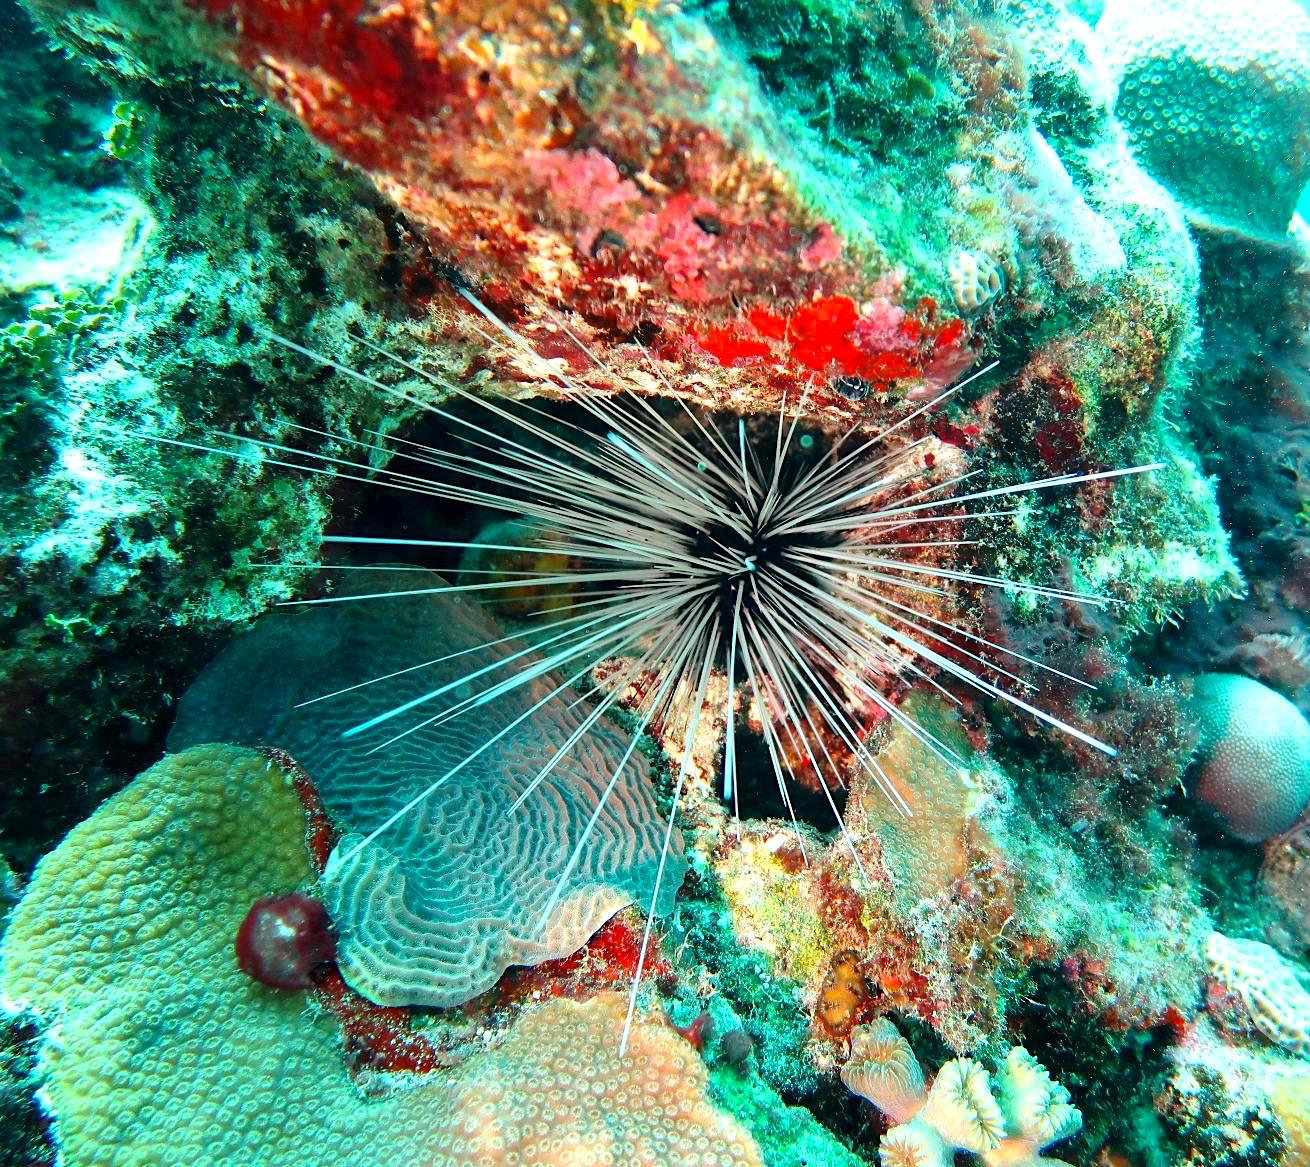 Long-spined sea urchin Diadema antillarum (Melinda Rodgers / Dive Abaco)